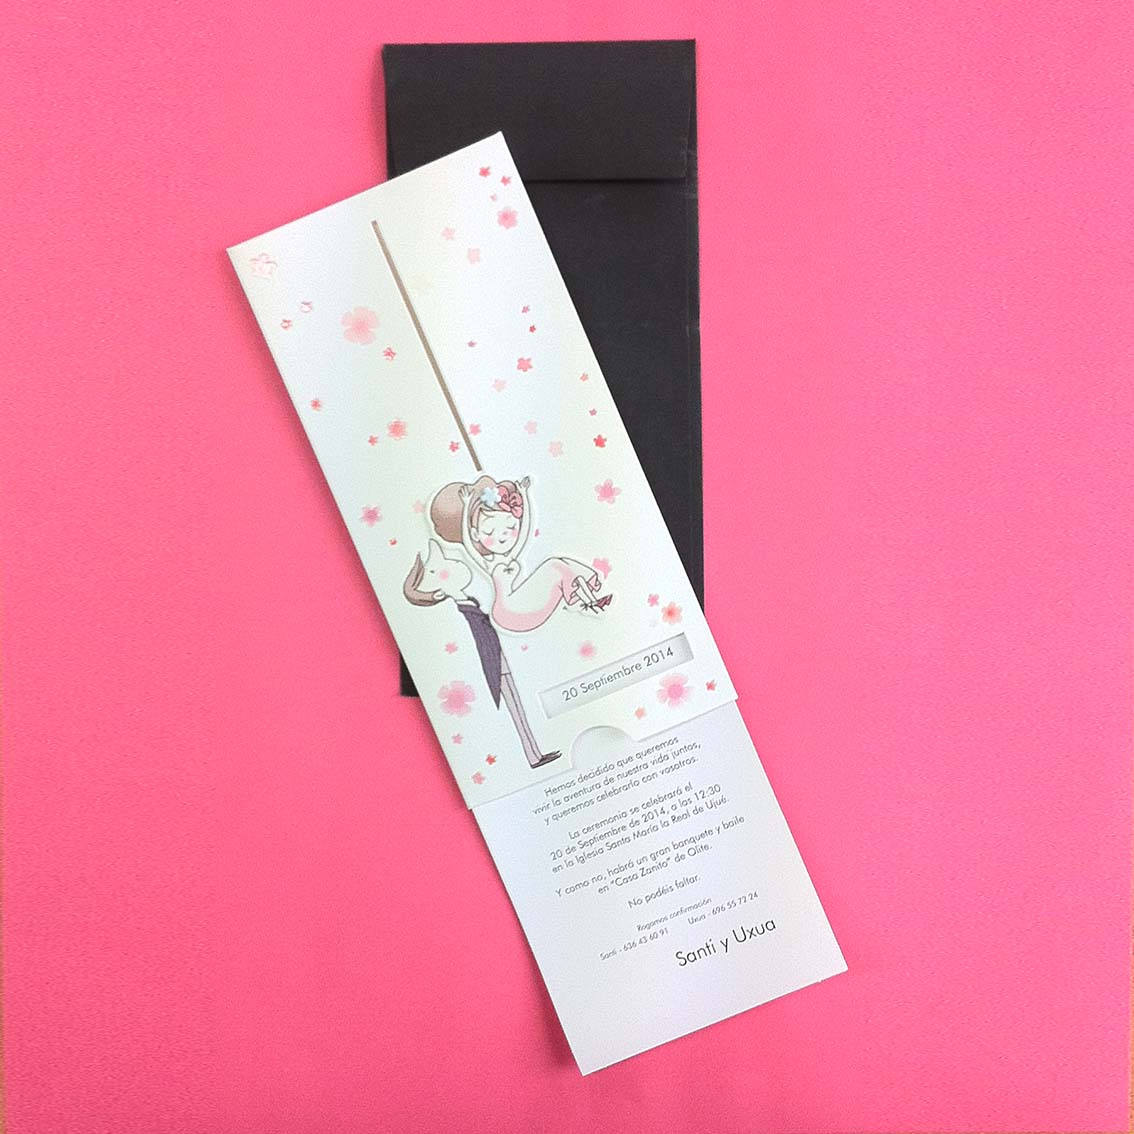 Imprimir invitaciones boda pamplona